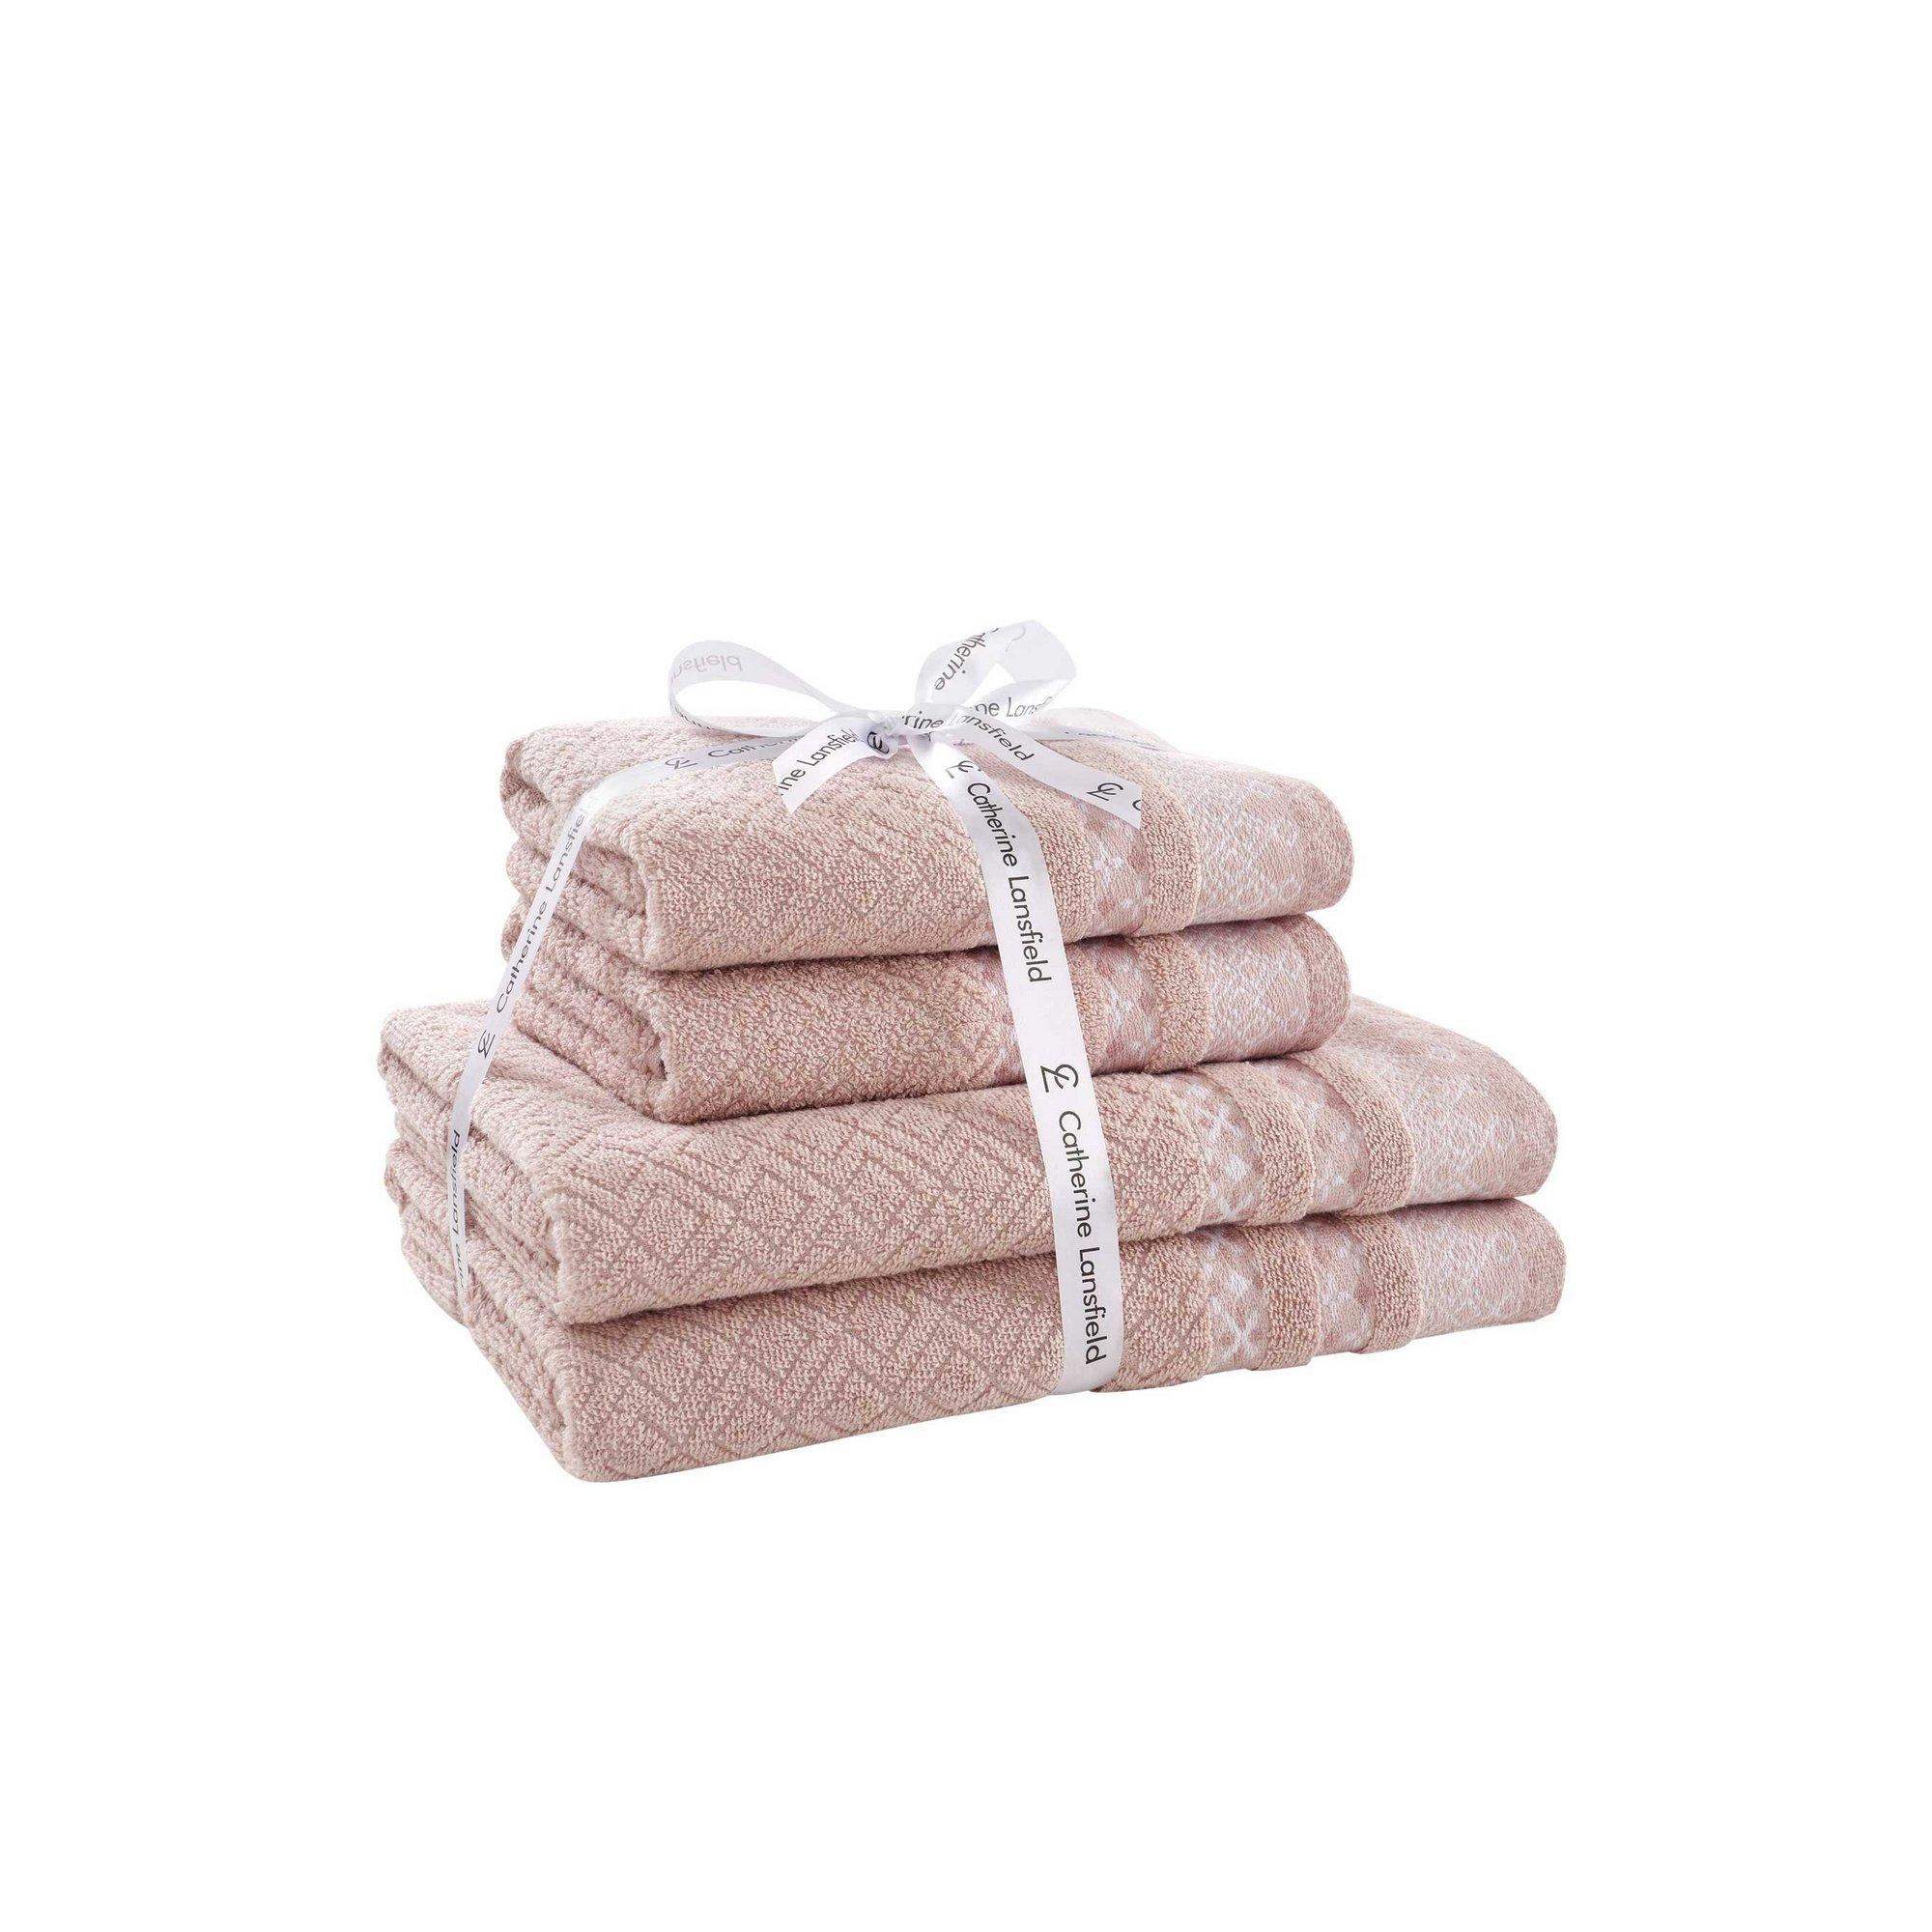 Image of Catherine Lansfield Malawa Geo Bands 4 Piece Towel Bale